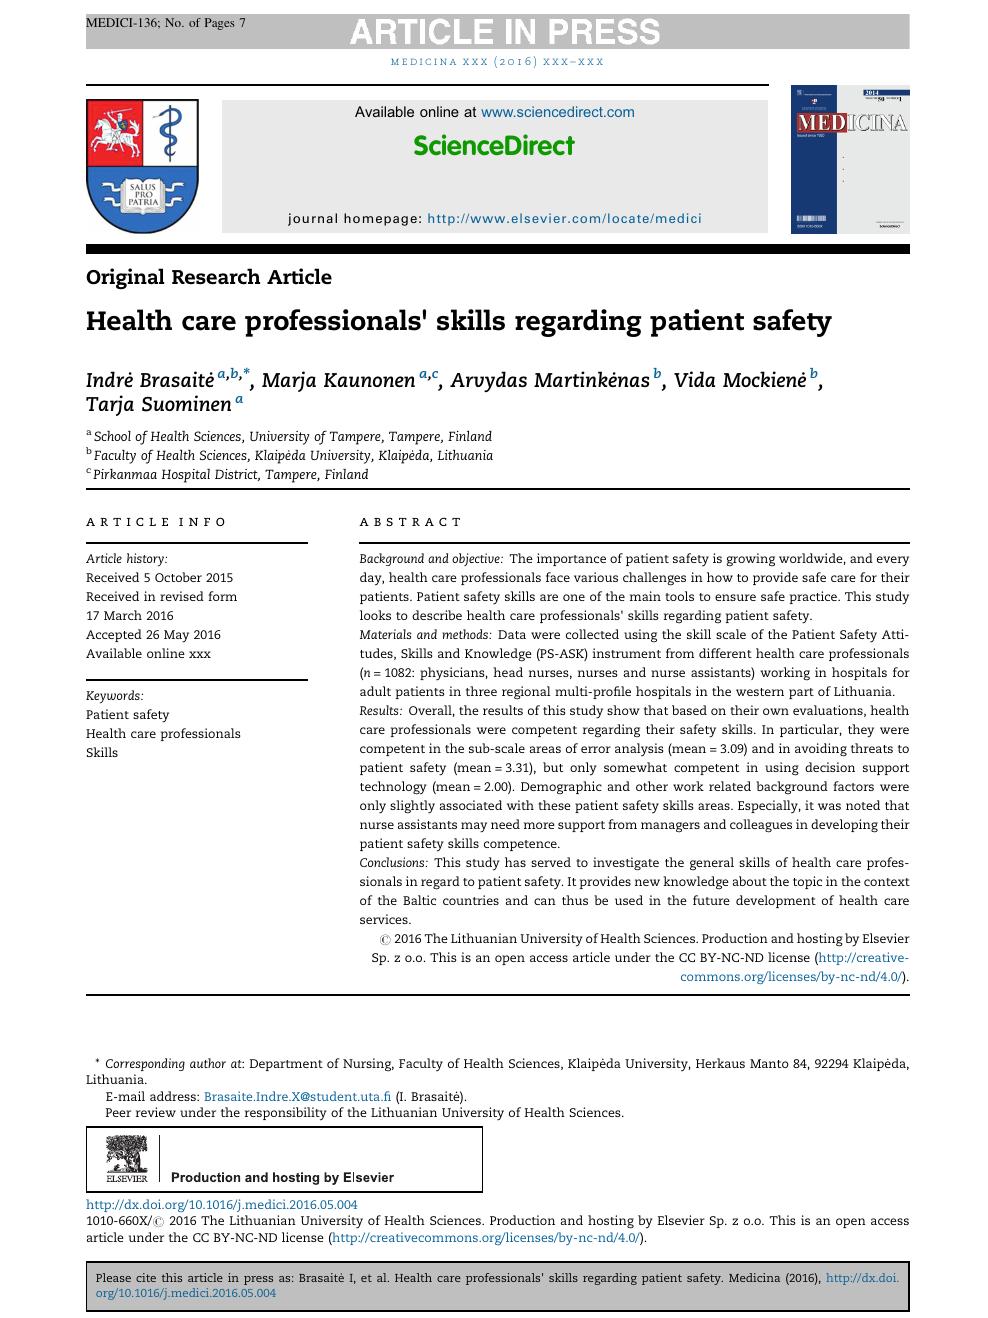 Health care professionals' skills regarding patient safety